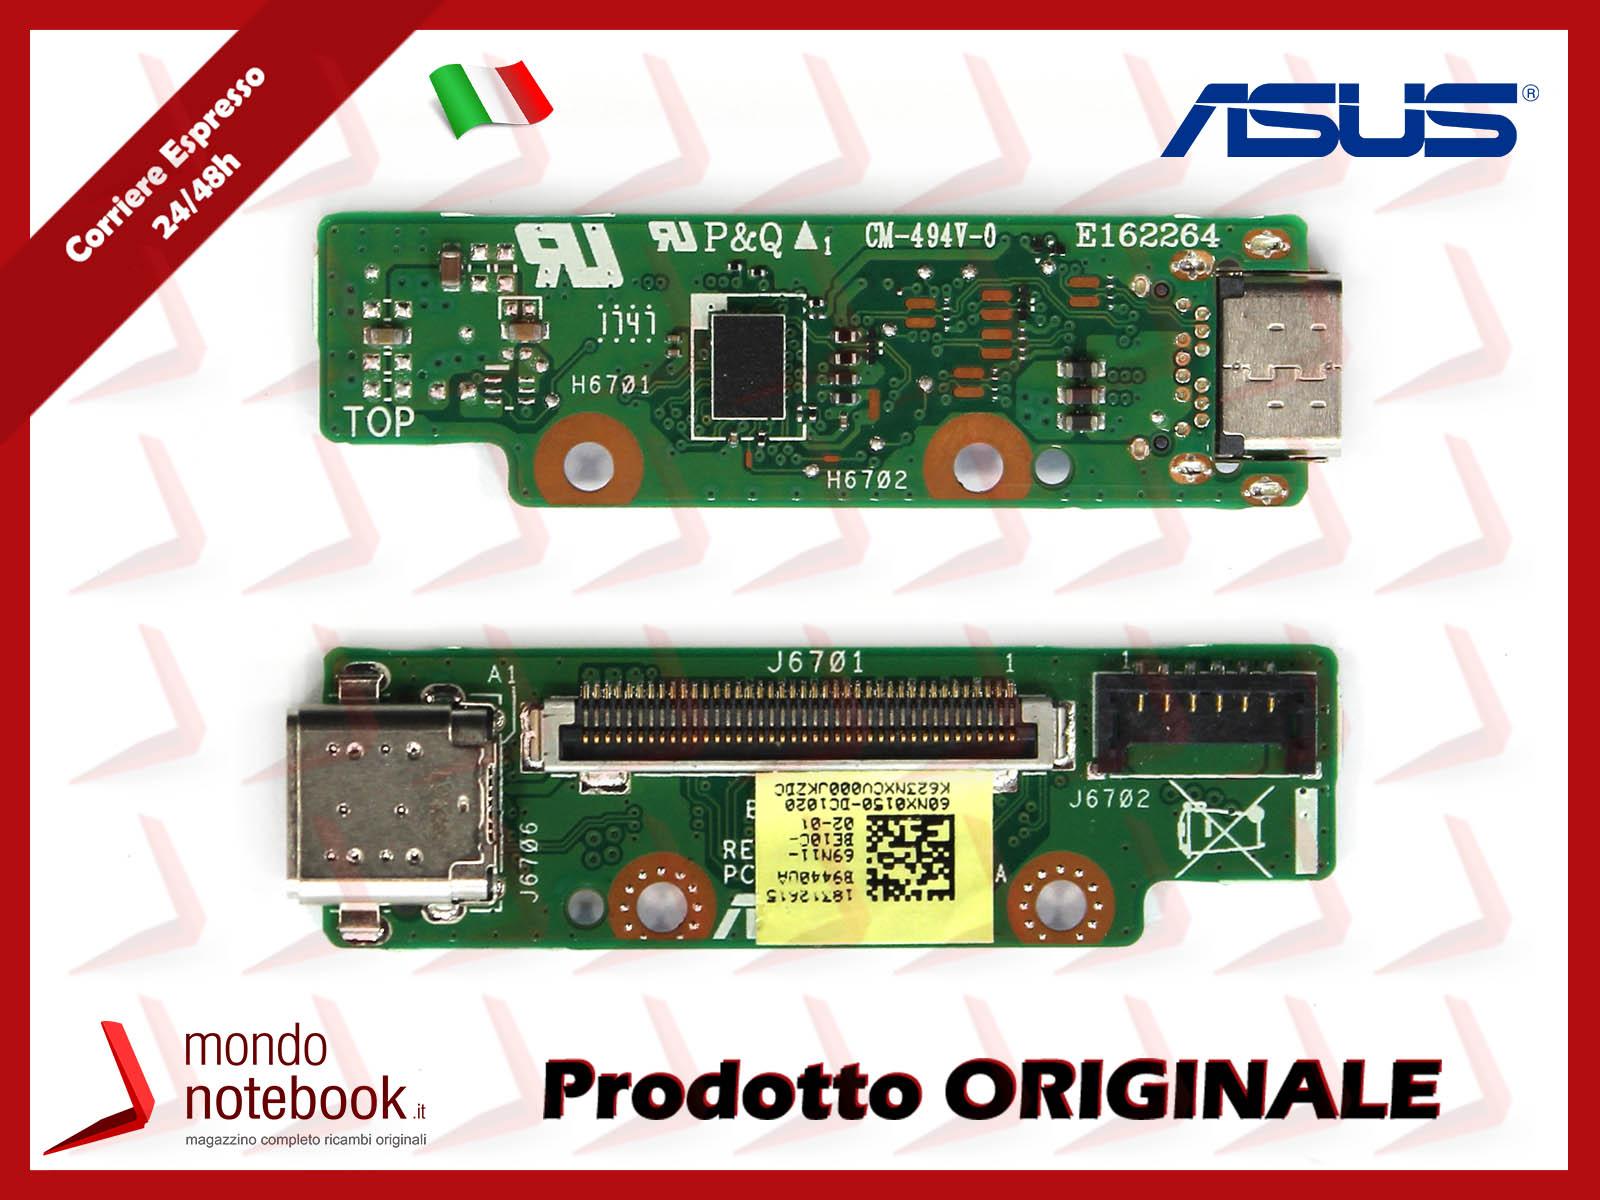 https://www.mondonotebook.it/7416/inverter-board-lcd-toshiba-toshiba-satellite-a110-a200-series.jpg